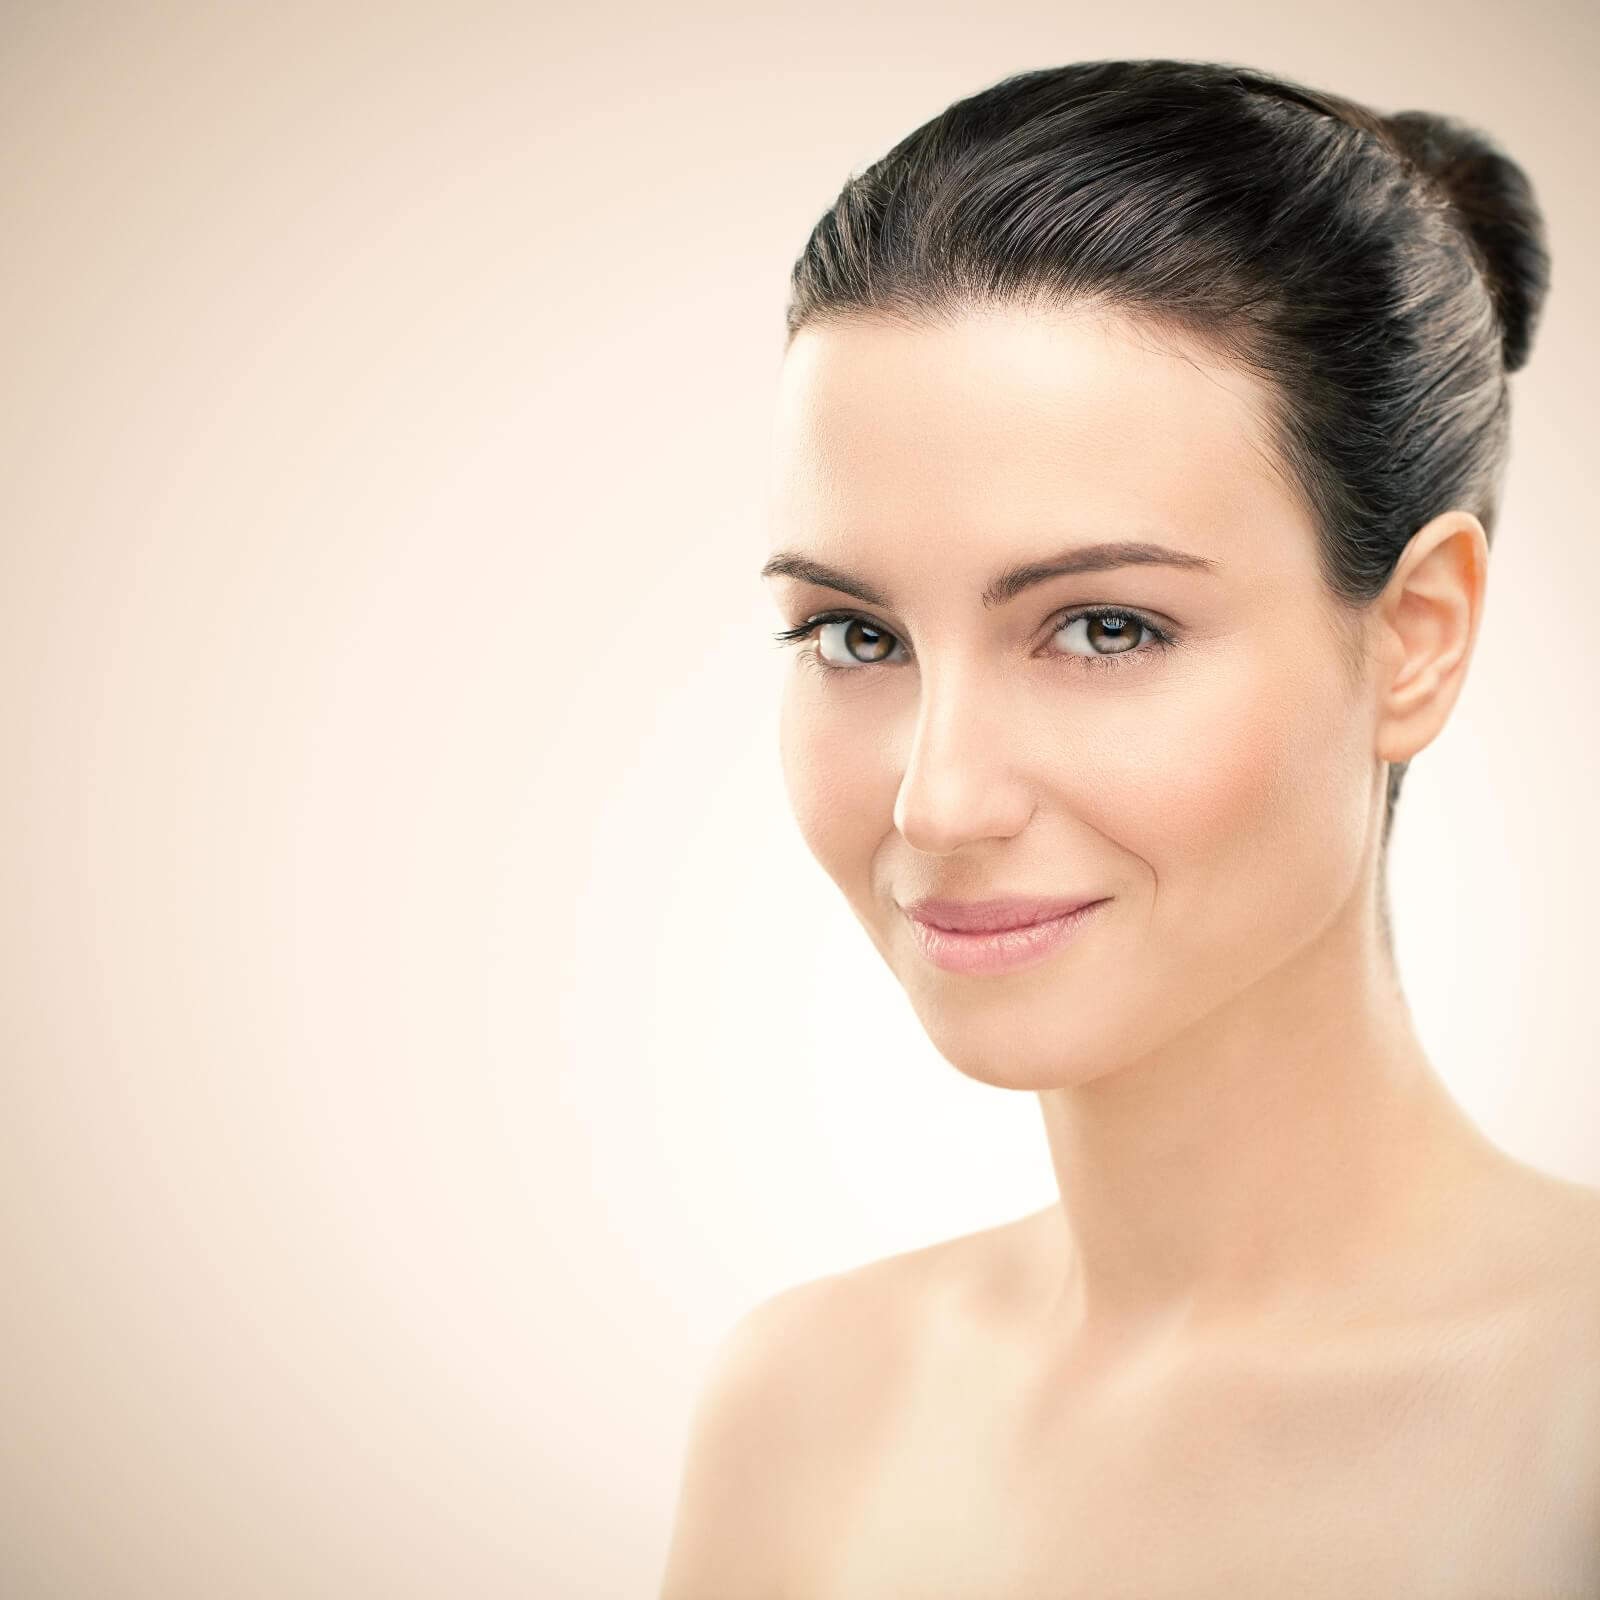 Breast Augmentation (Prosthesis)